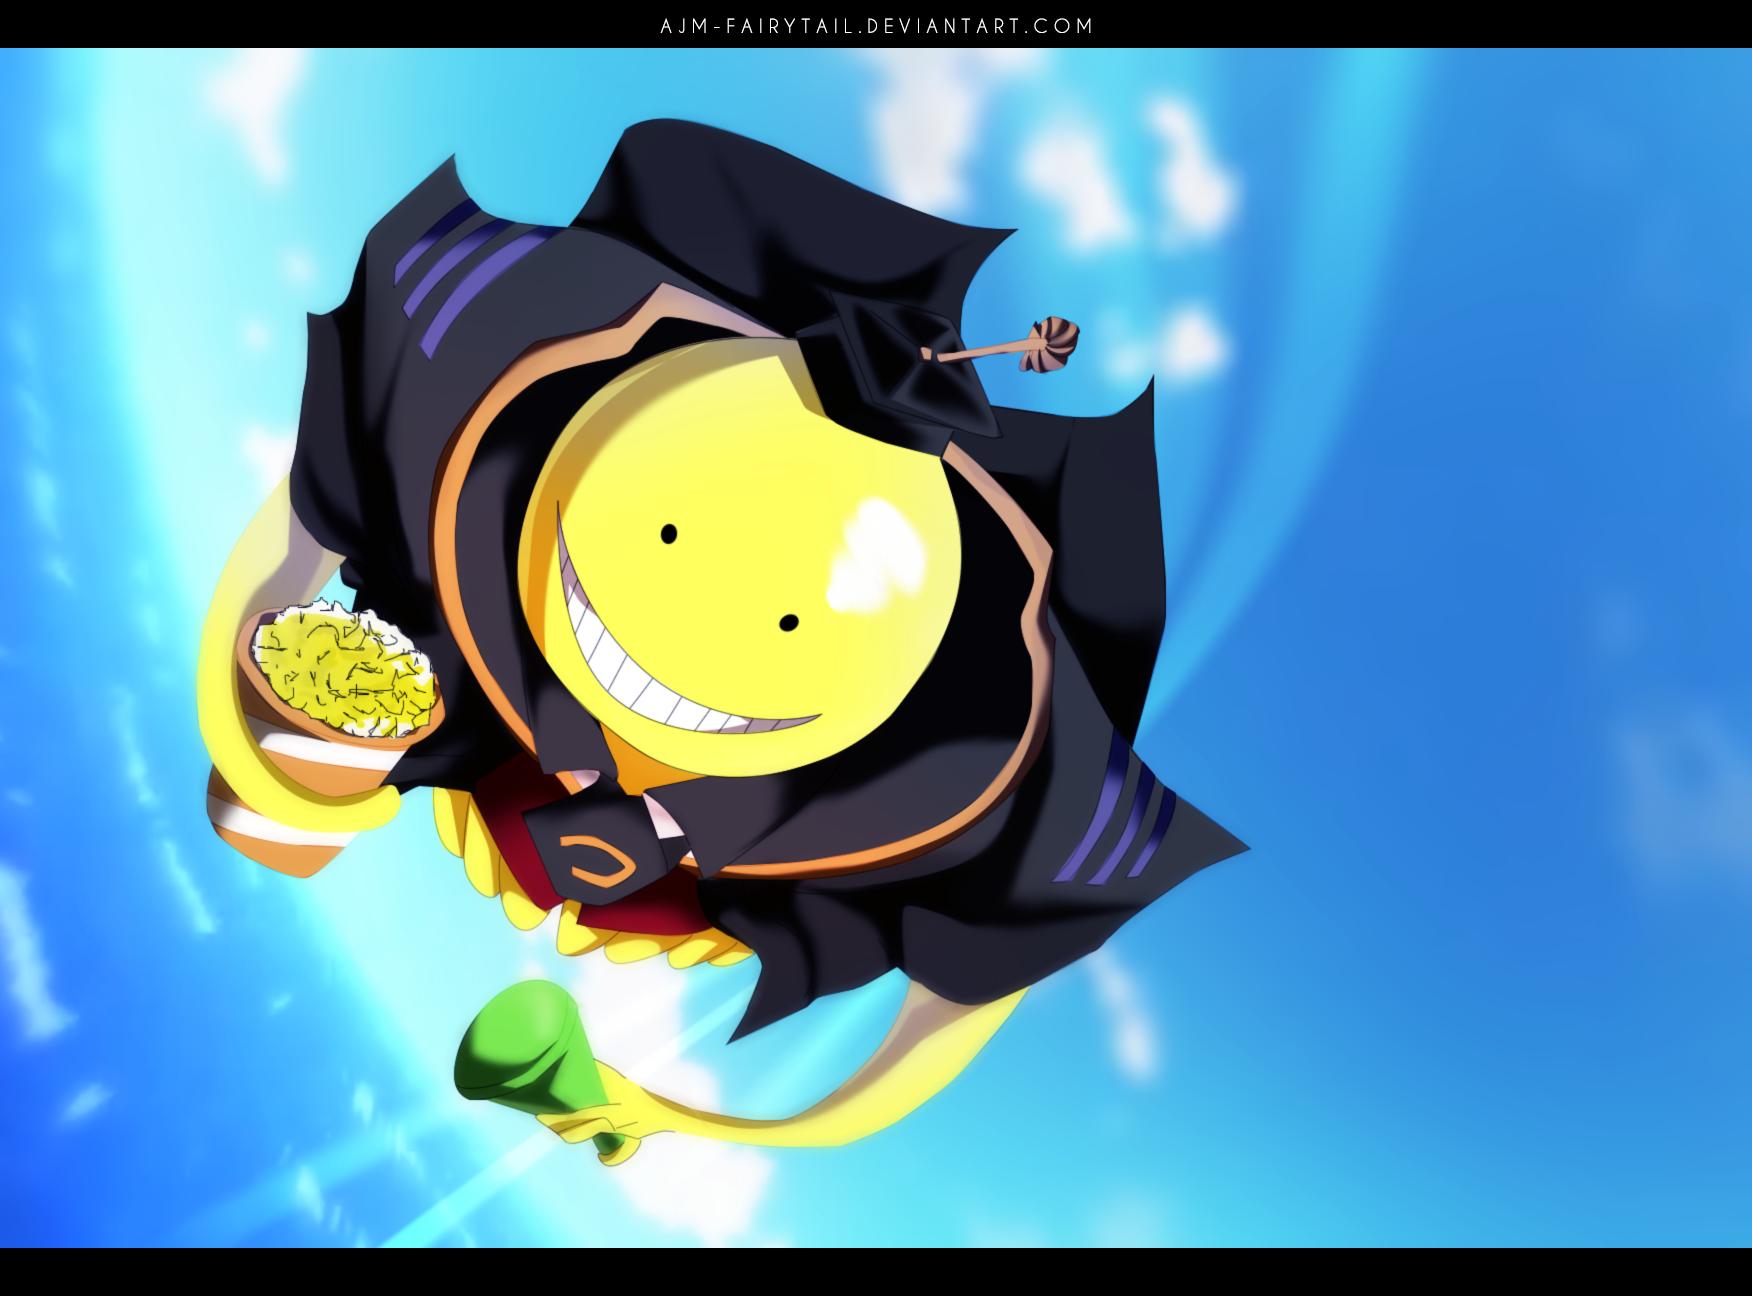 Koro Sensei By Ajm Fairytail Assassination Classroom Assasination Classroom Koro